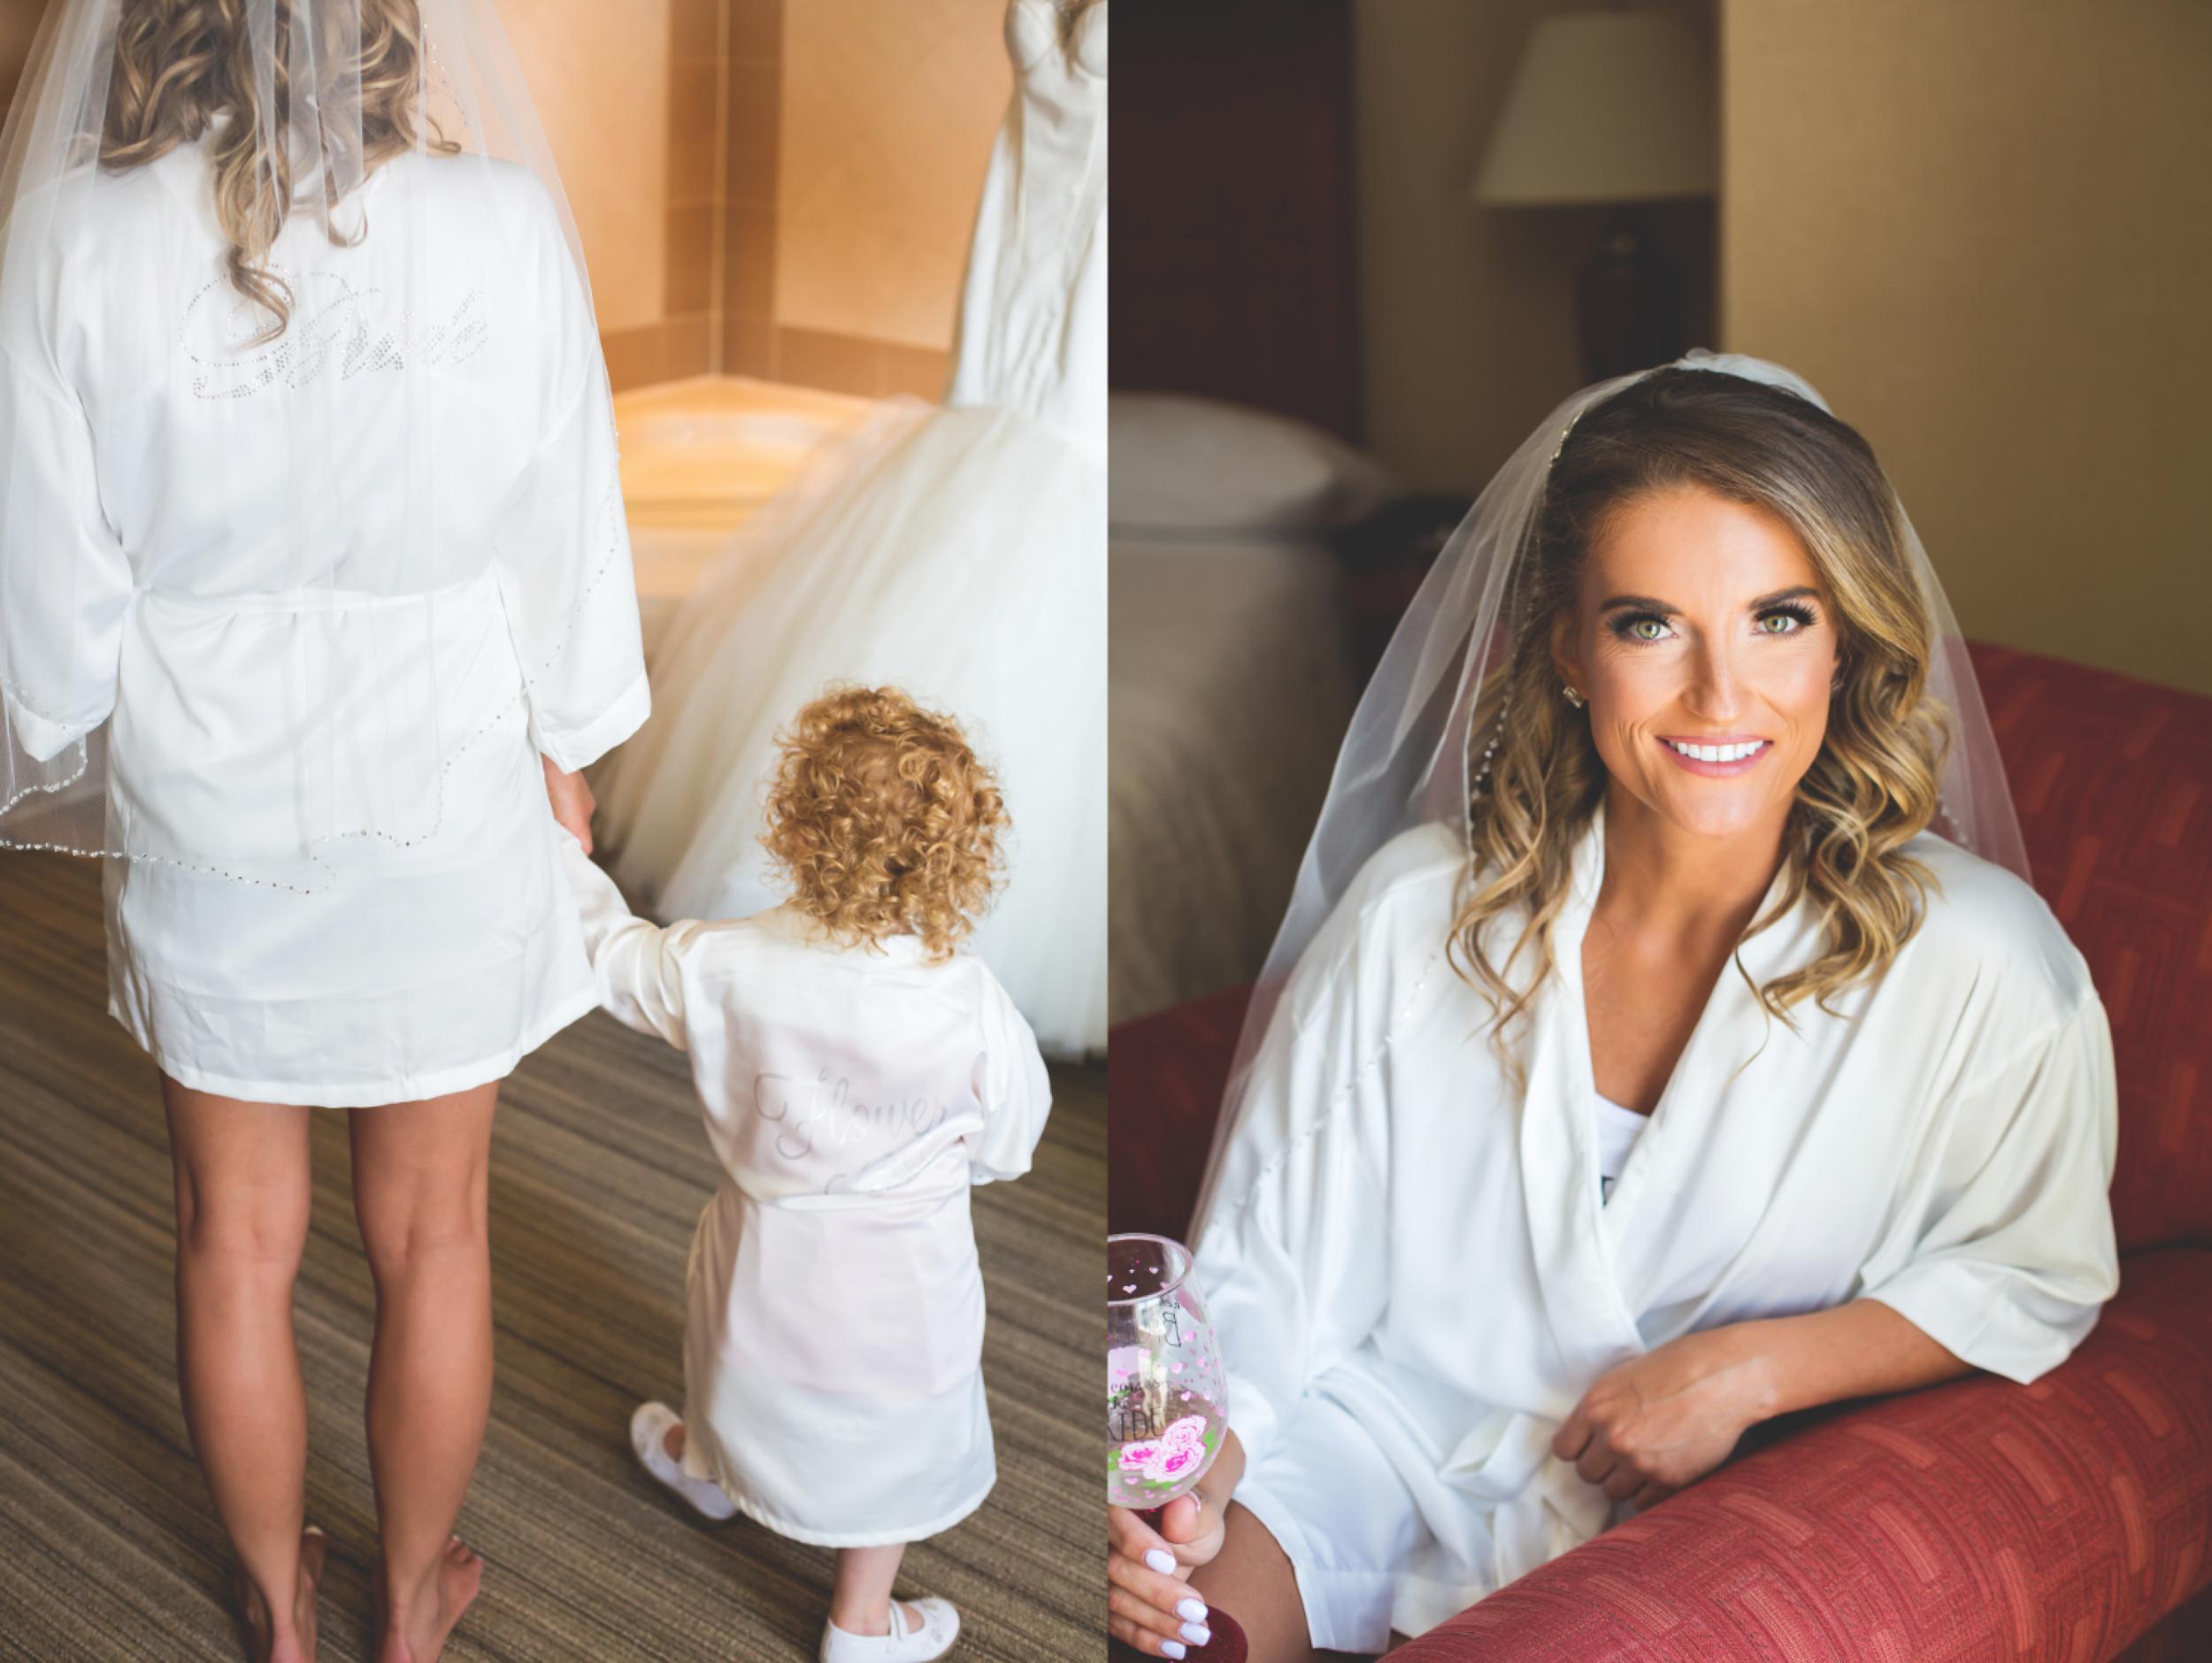 Wedding-Burlington-Convention-Center-Burlington-Oakville-Toronto-Hamilton-Niagara-Wedding-Photographer-Photography-Moments-by-Lauren-Photo-Image-5.png